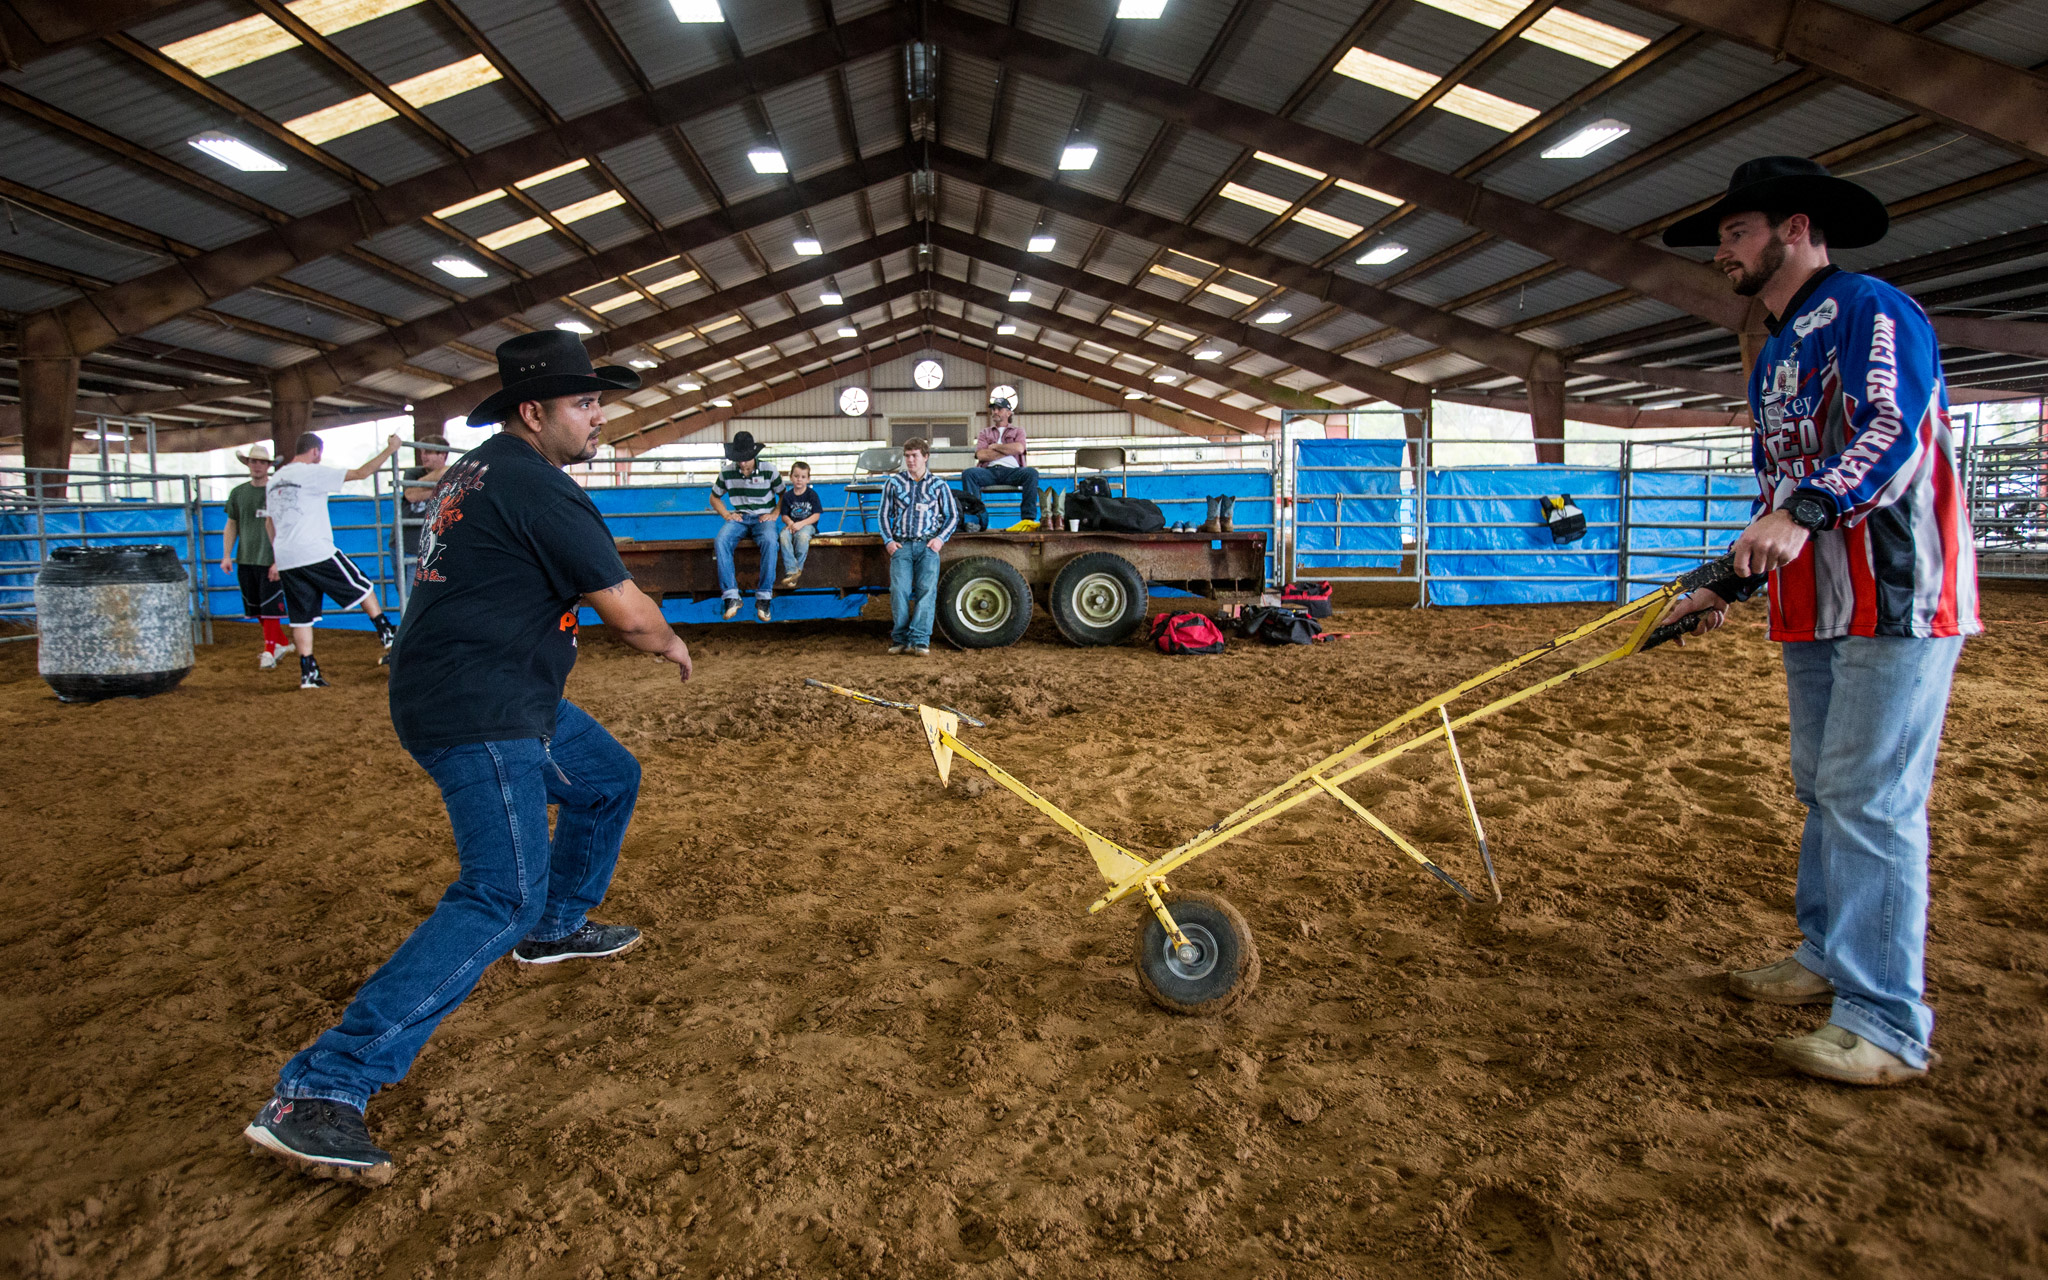 Sankey Rodeo Bull Fighter Training Espn